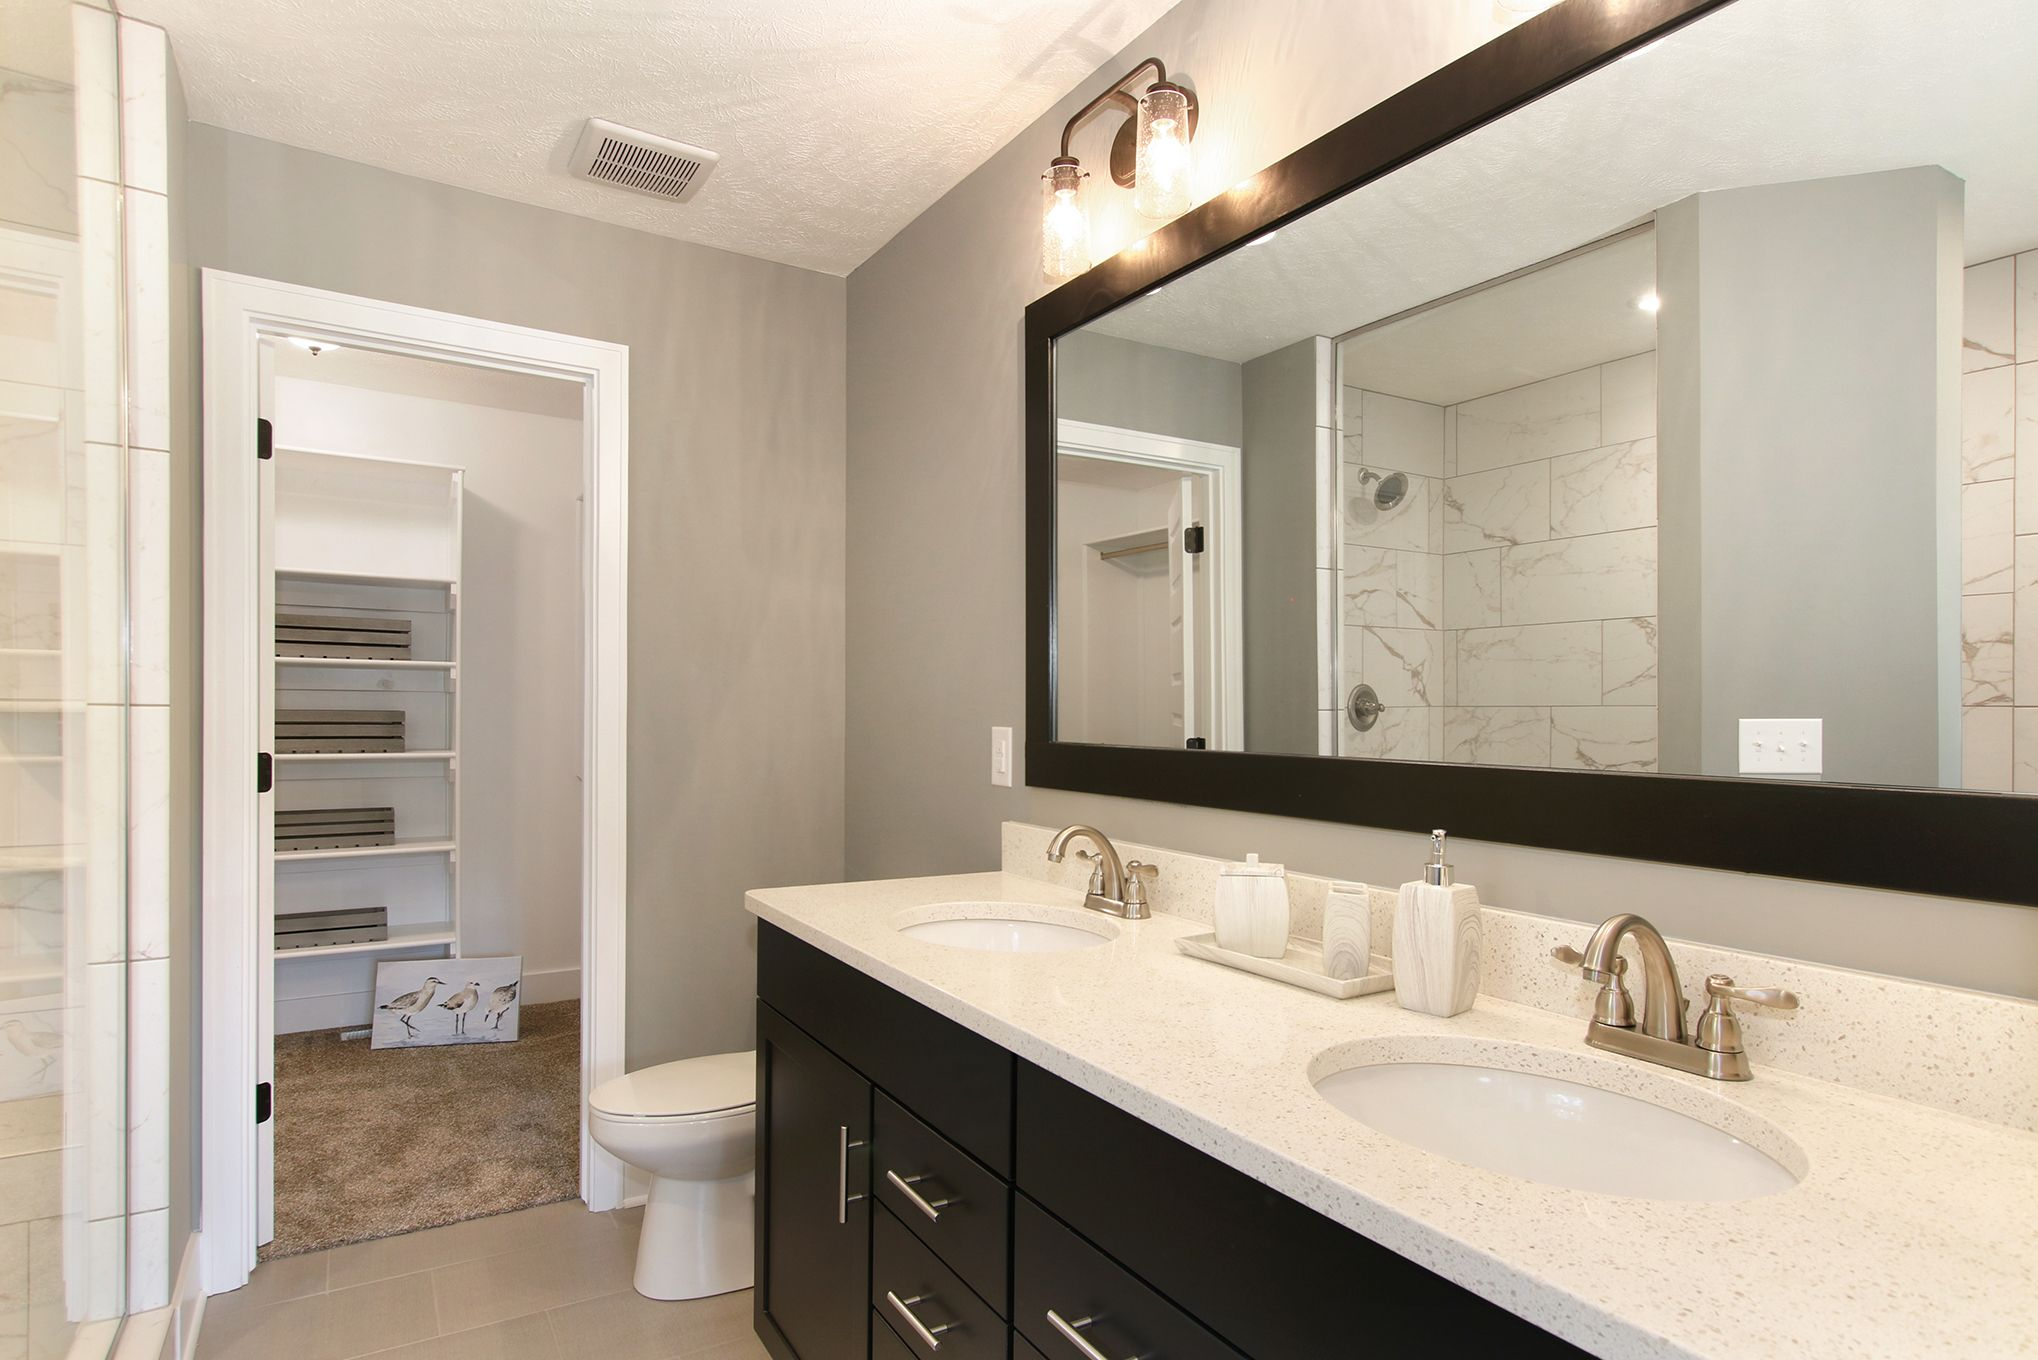 Bathroom featured in The Hadley By Eastbrook Homes Inc. in Lansing, MI